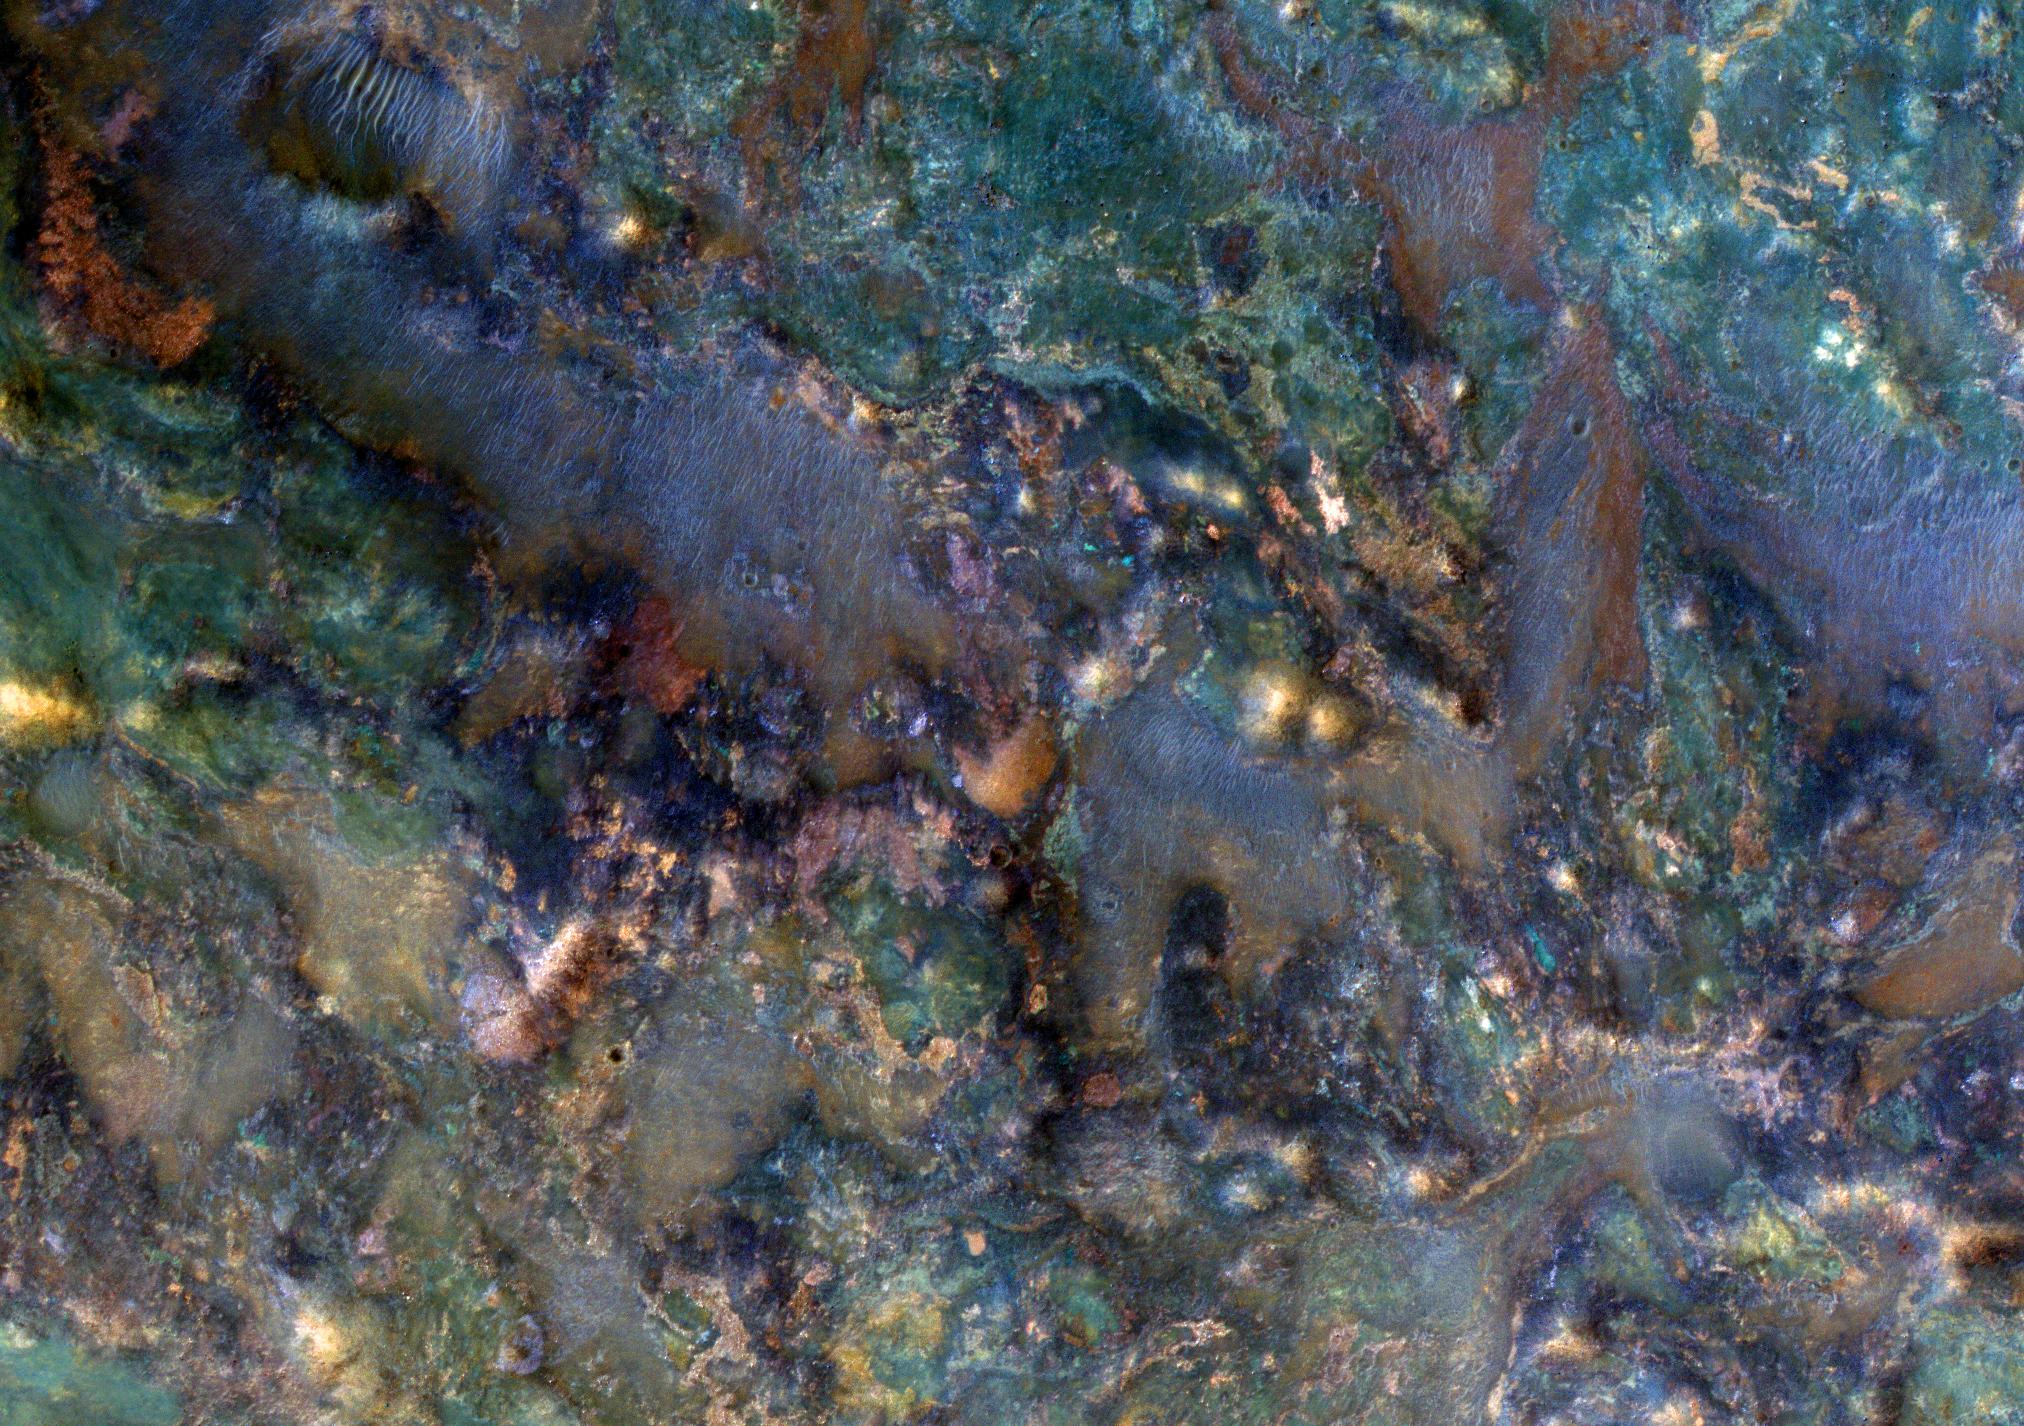 Enhanced-color rocks near Nili Fossae on Mars.